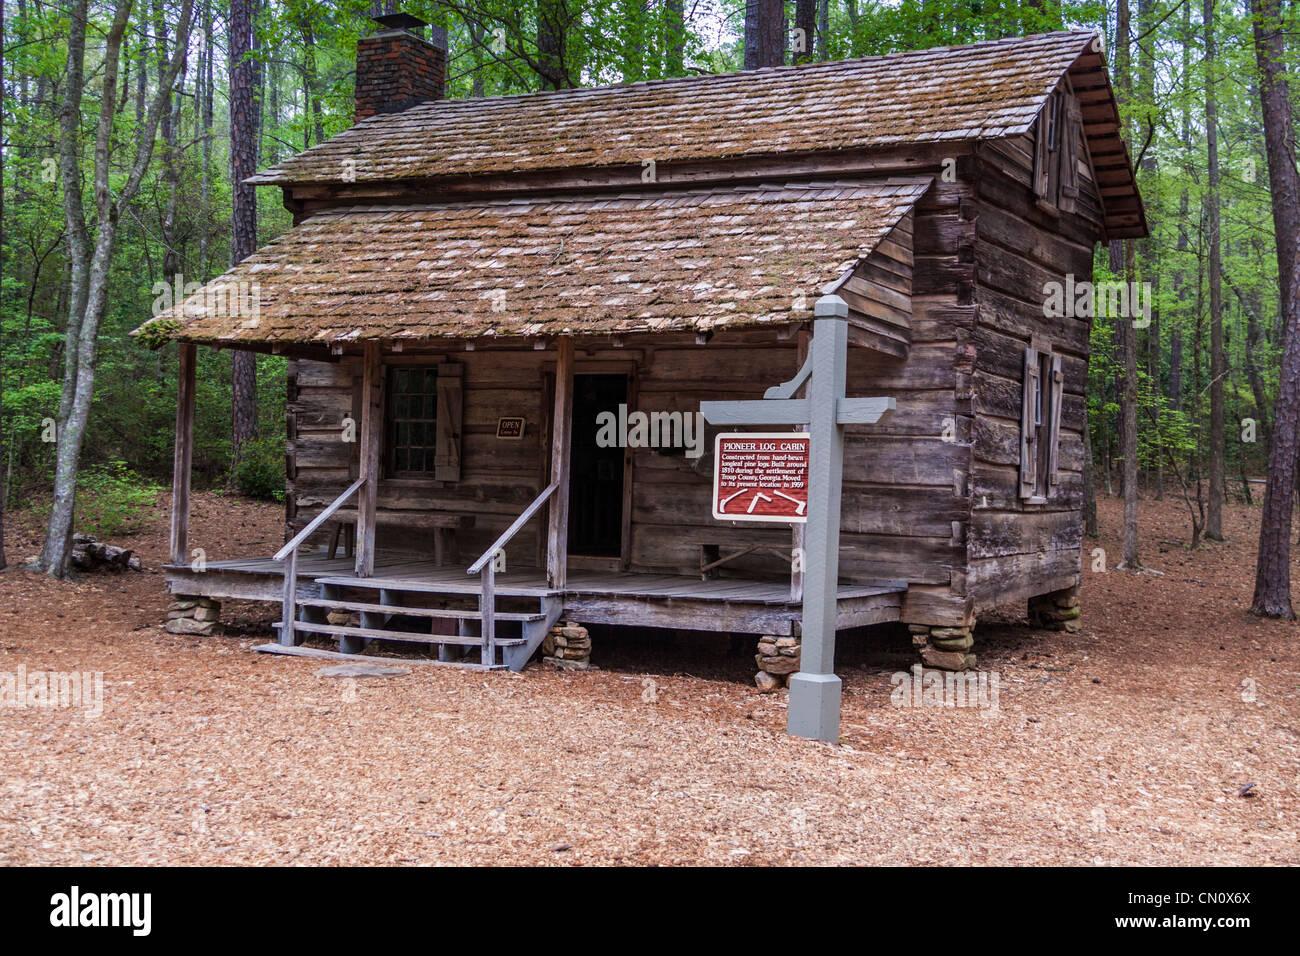 Pioneer Log Cabin At Callaway Gardens In Pine Mountain, Georgia.